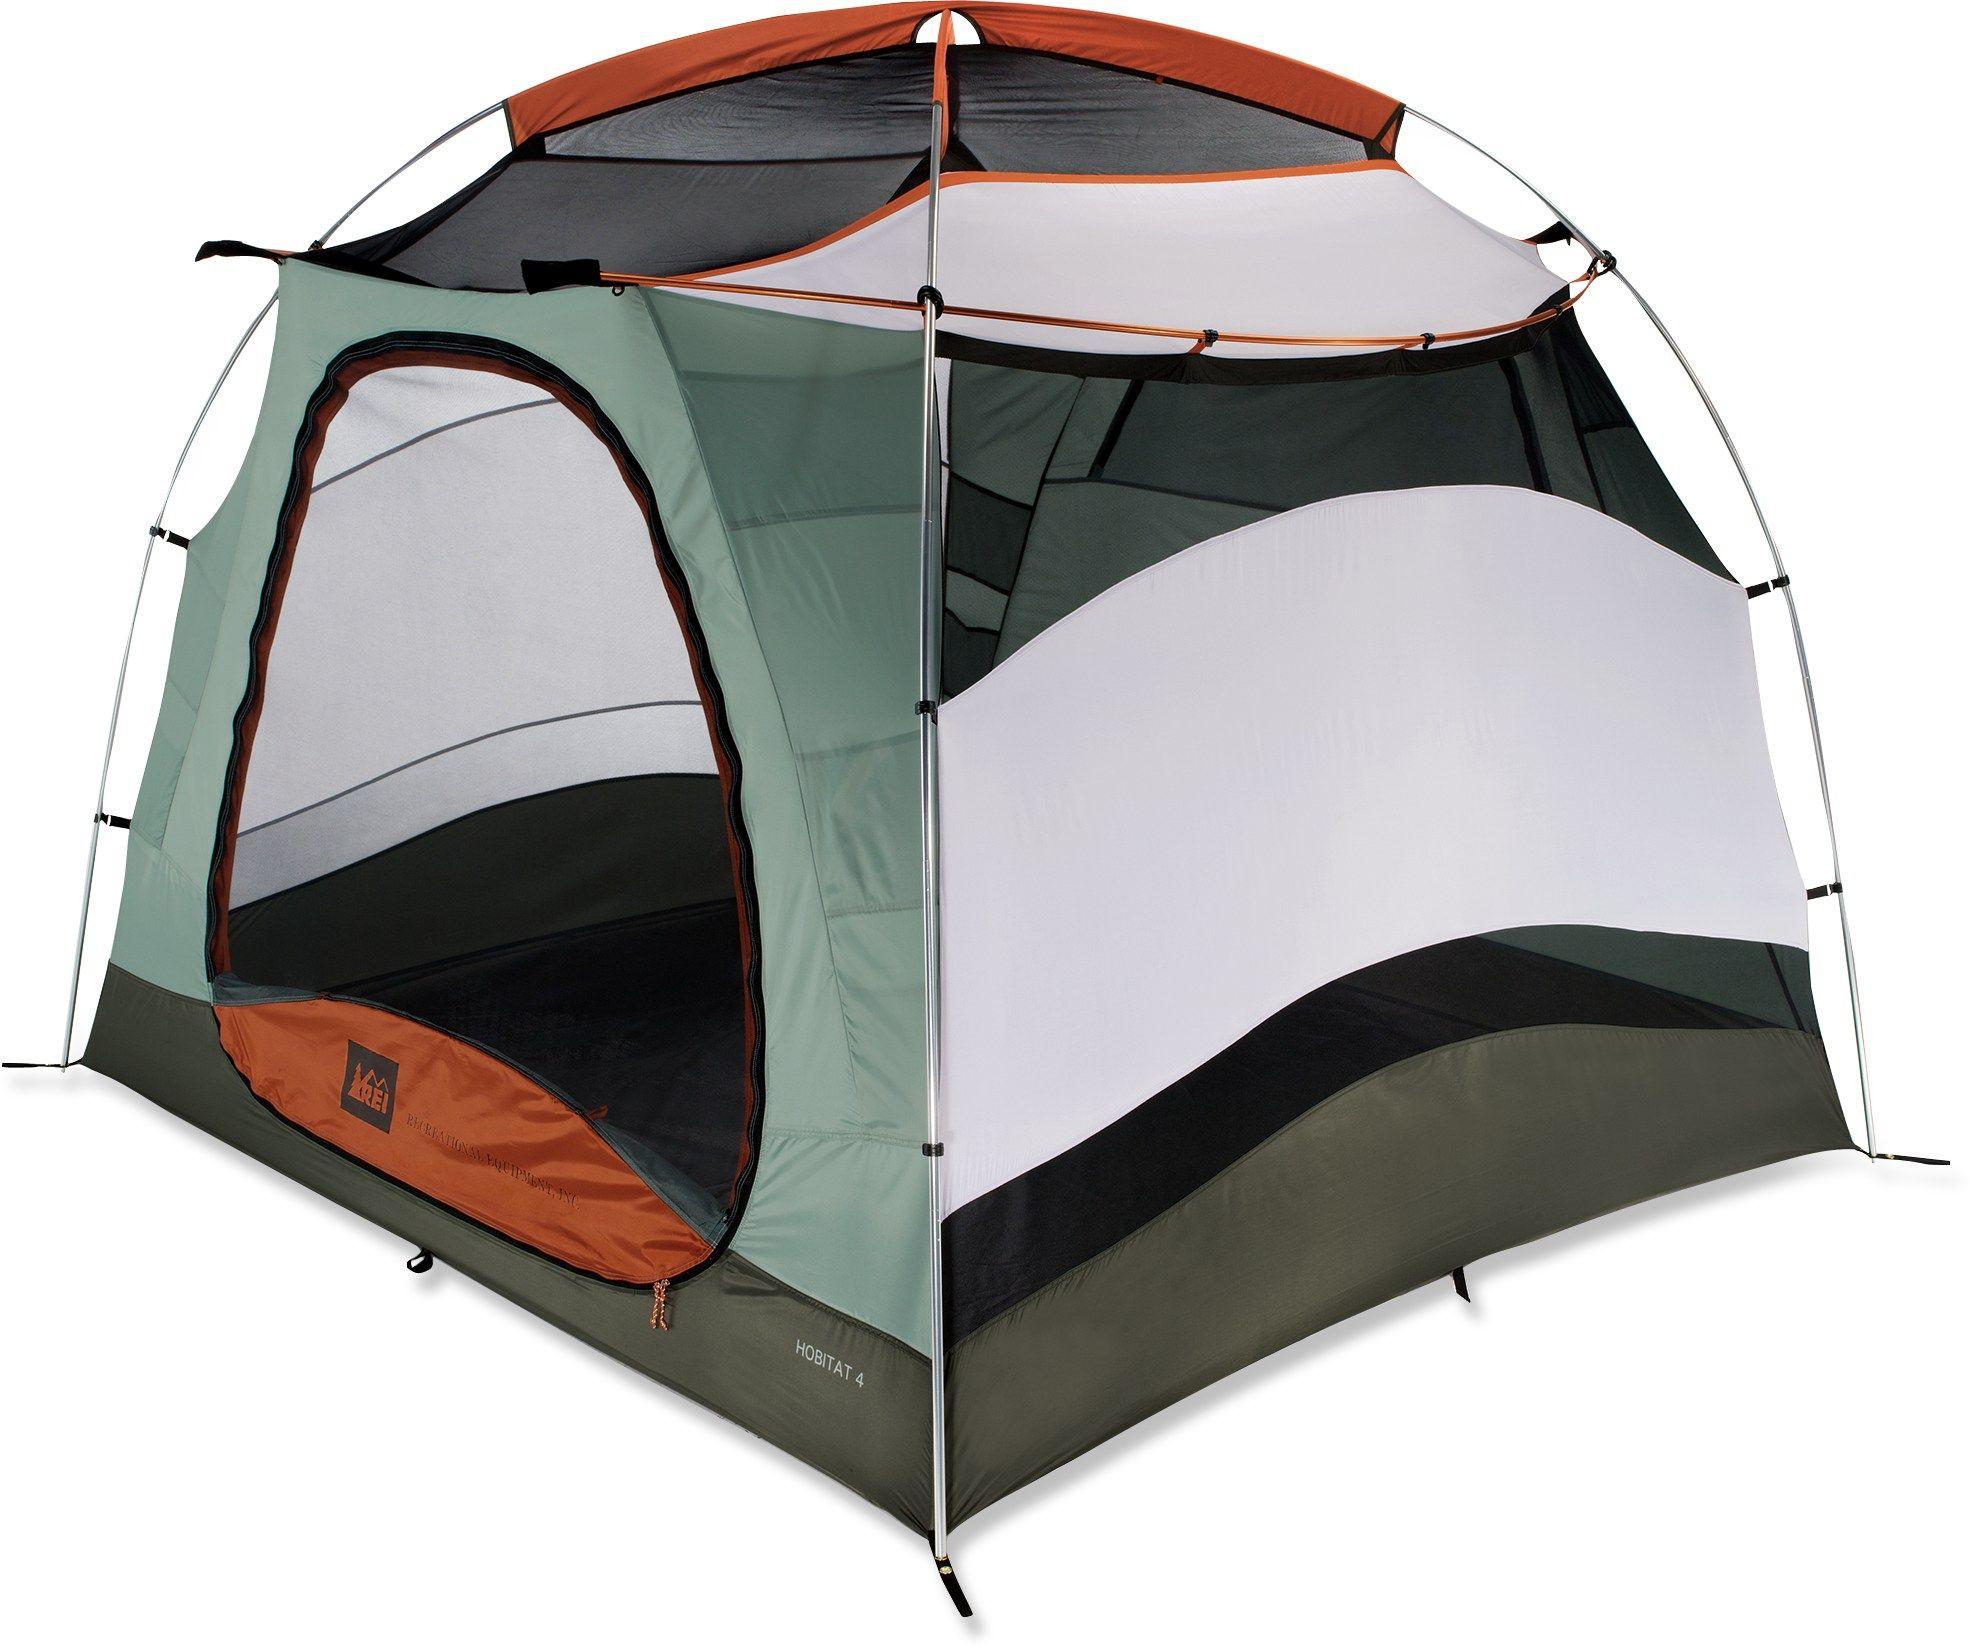 REI Hobitat 4 Tent - Special Buy - Free Shipping at REI-OUTLET.com  sc 1 st  Pinterest & REI Hobitat 4 Tent - Special Buy - Free Shipping at REI-OUTLET.com ...